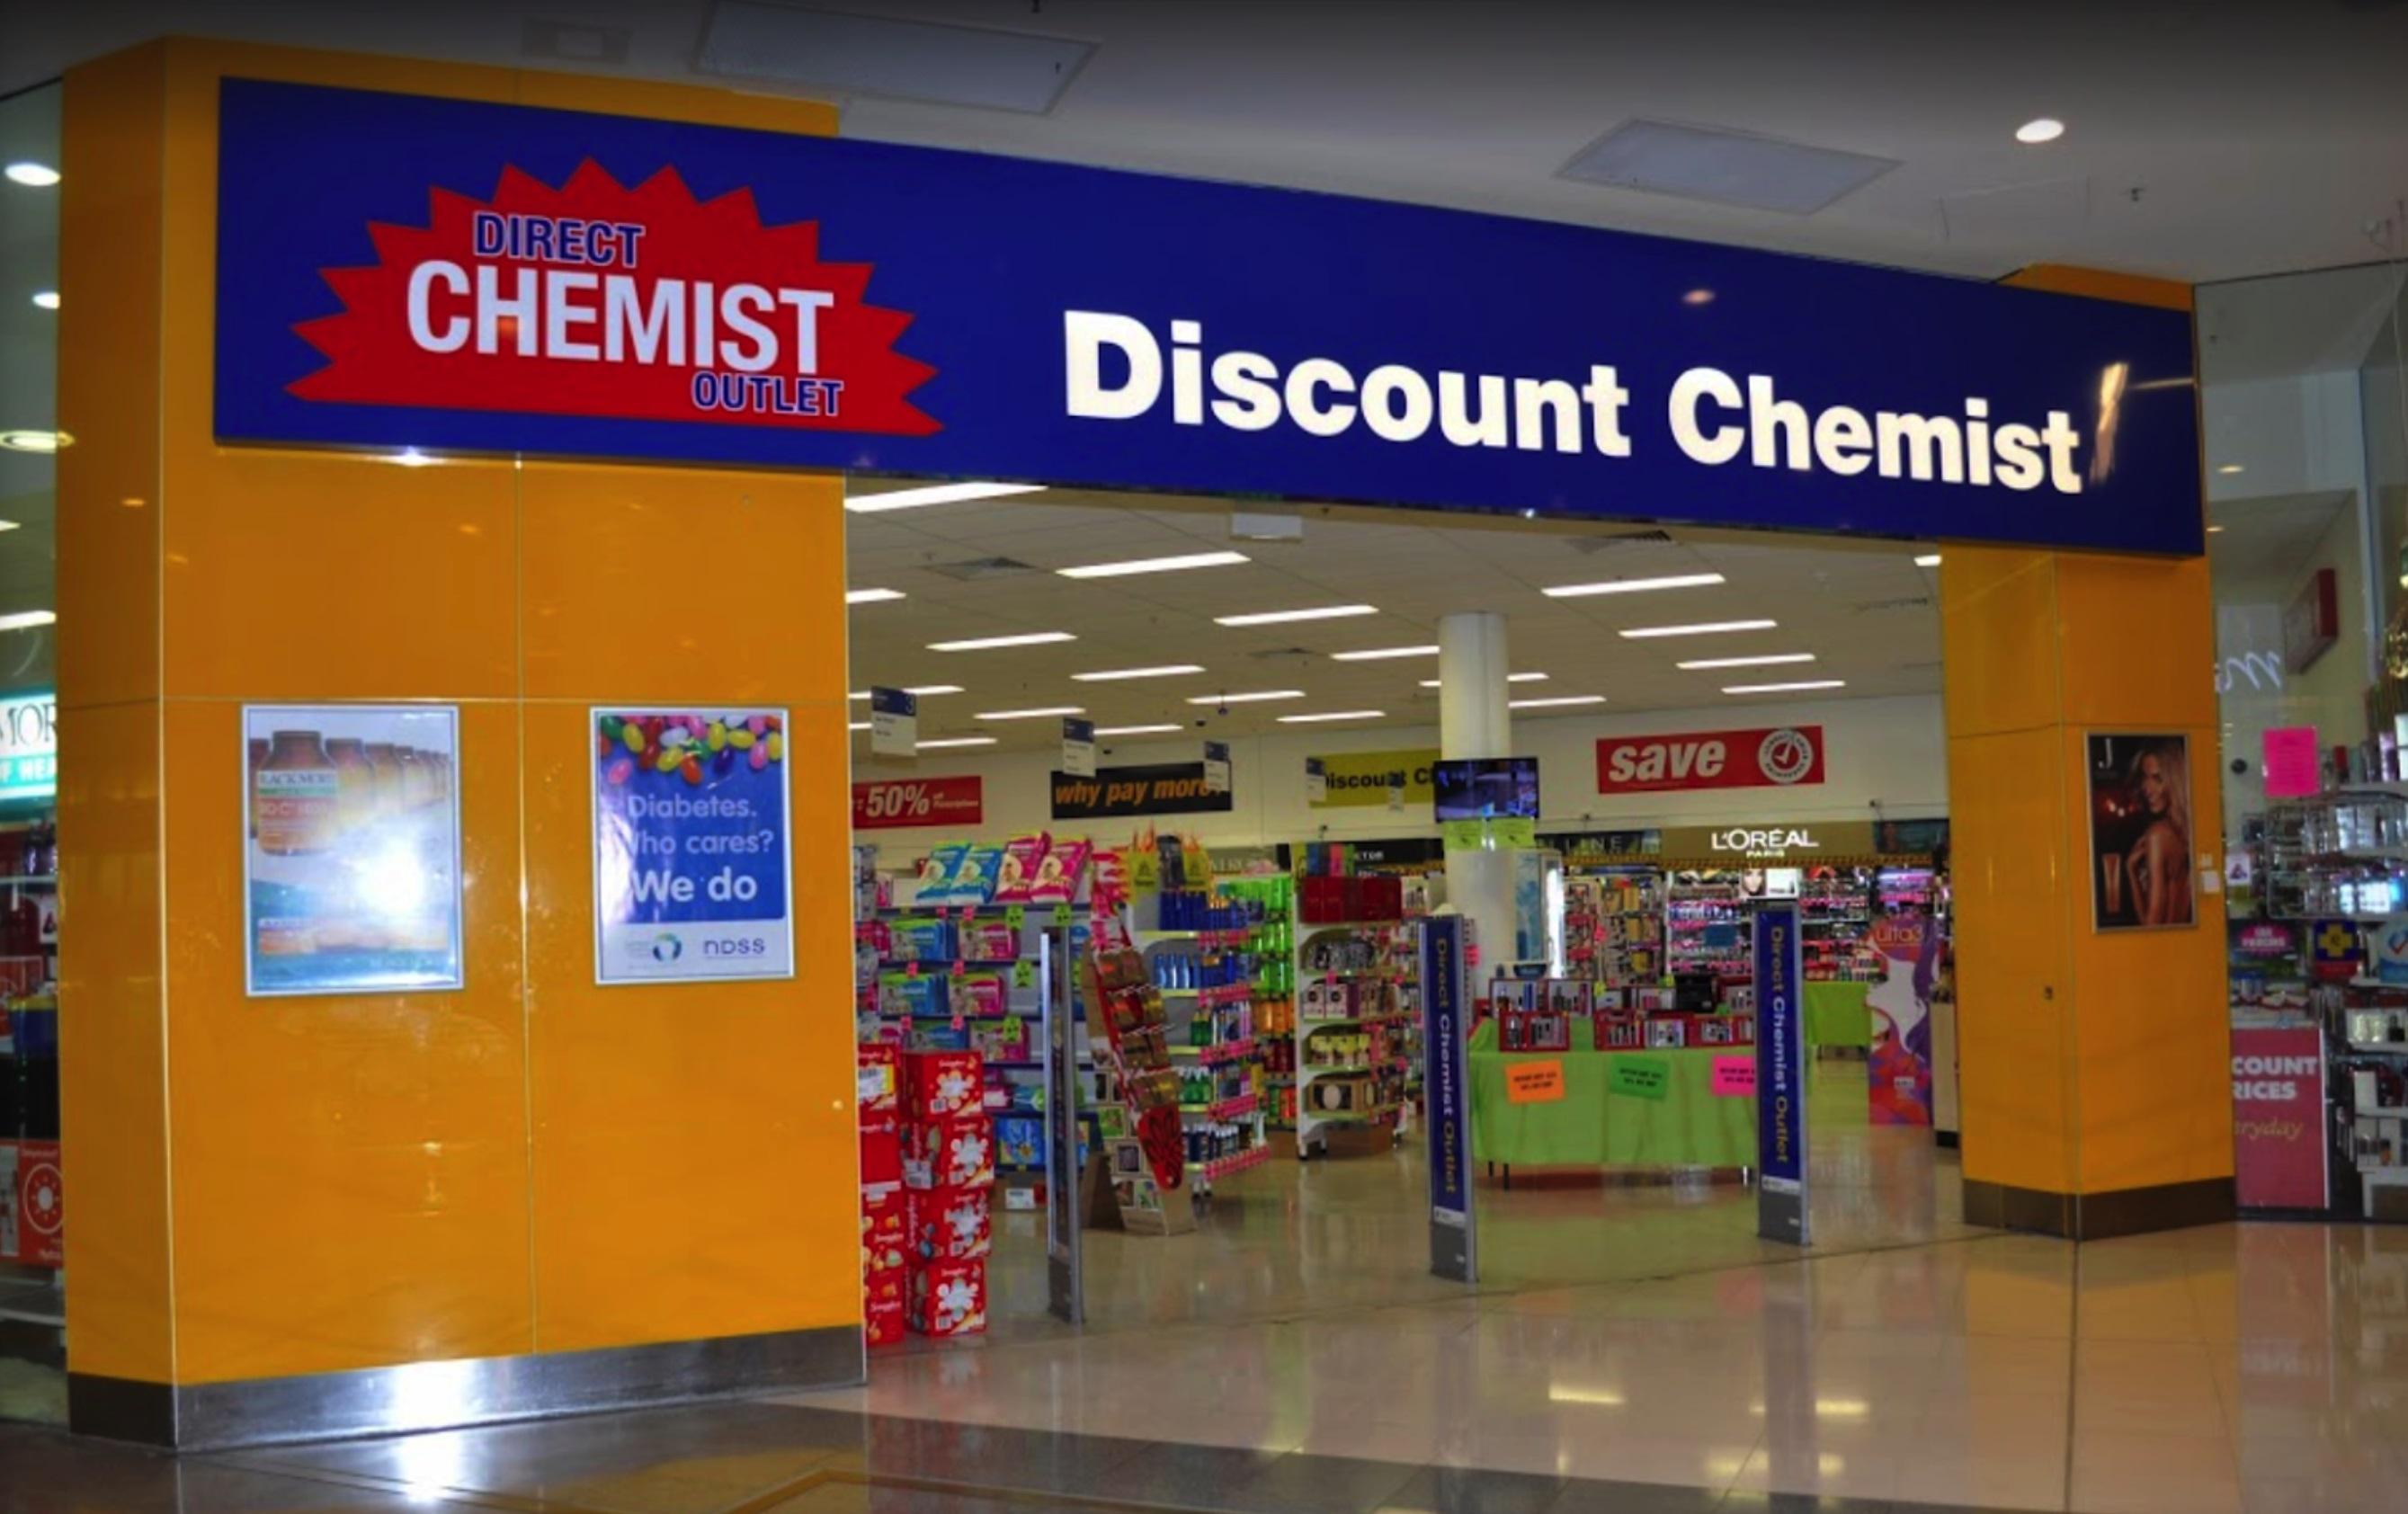 Direct Chemist Outlet Saphhire Marketplace